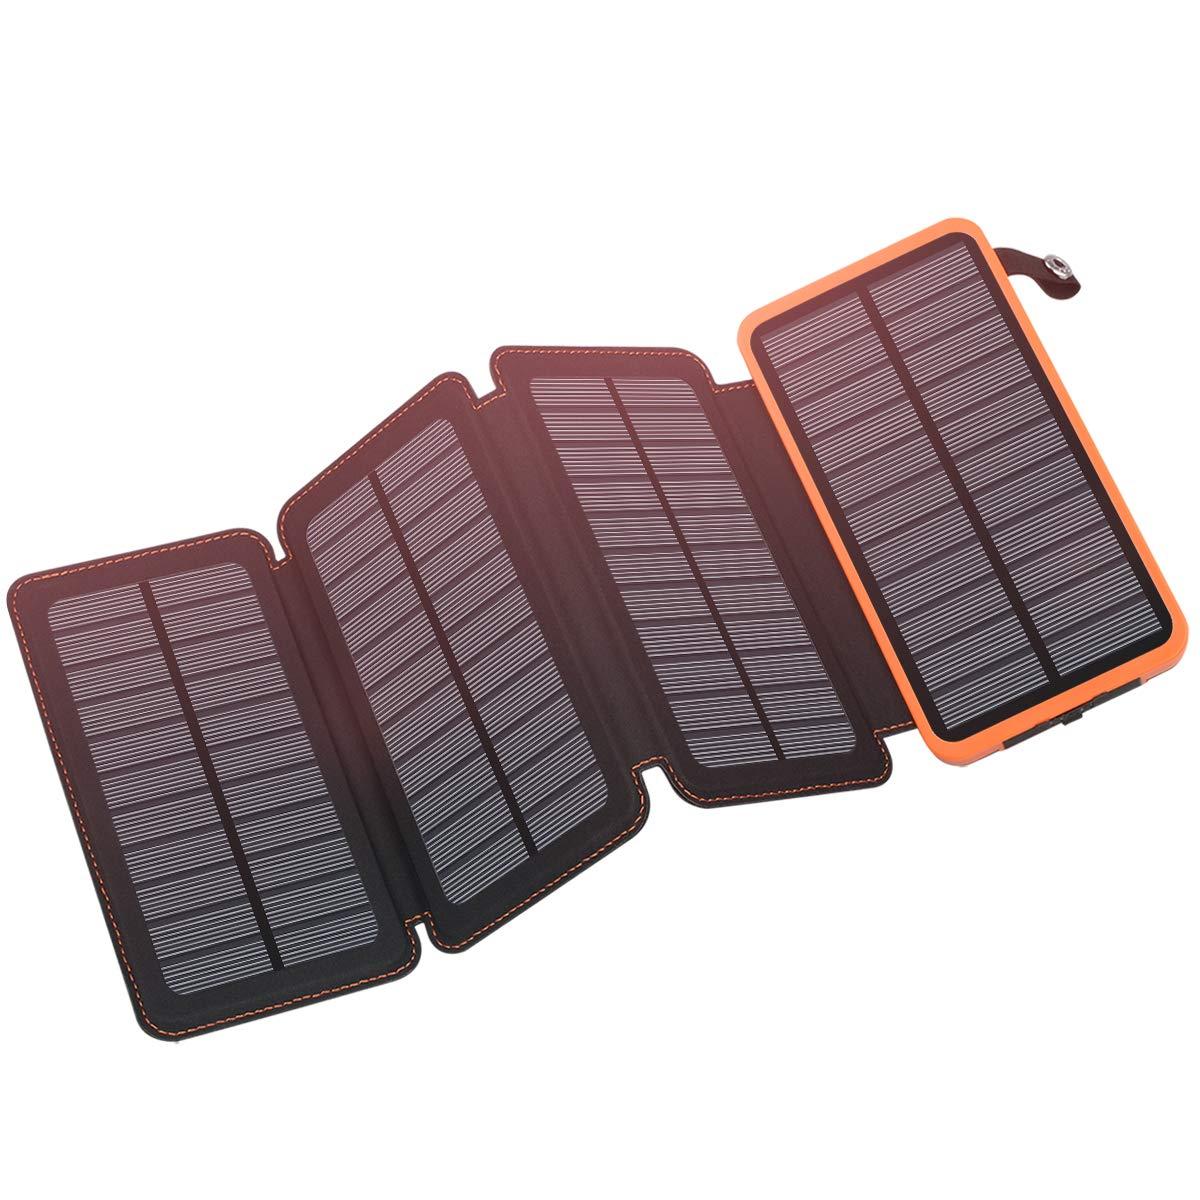 Solar Charger 25000mAh, FEELLE Portable Solar Power Bank